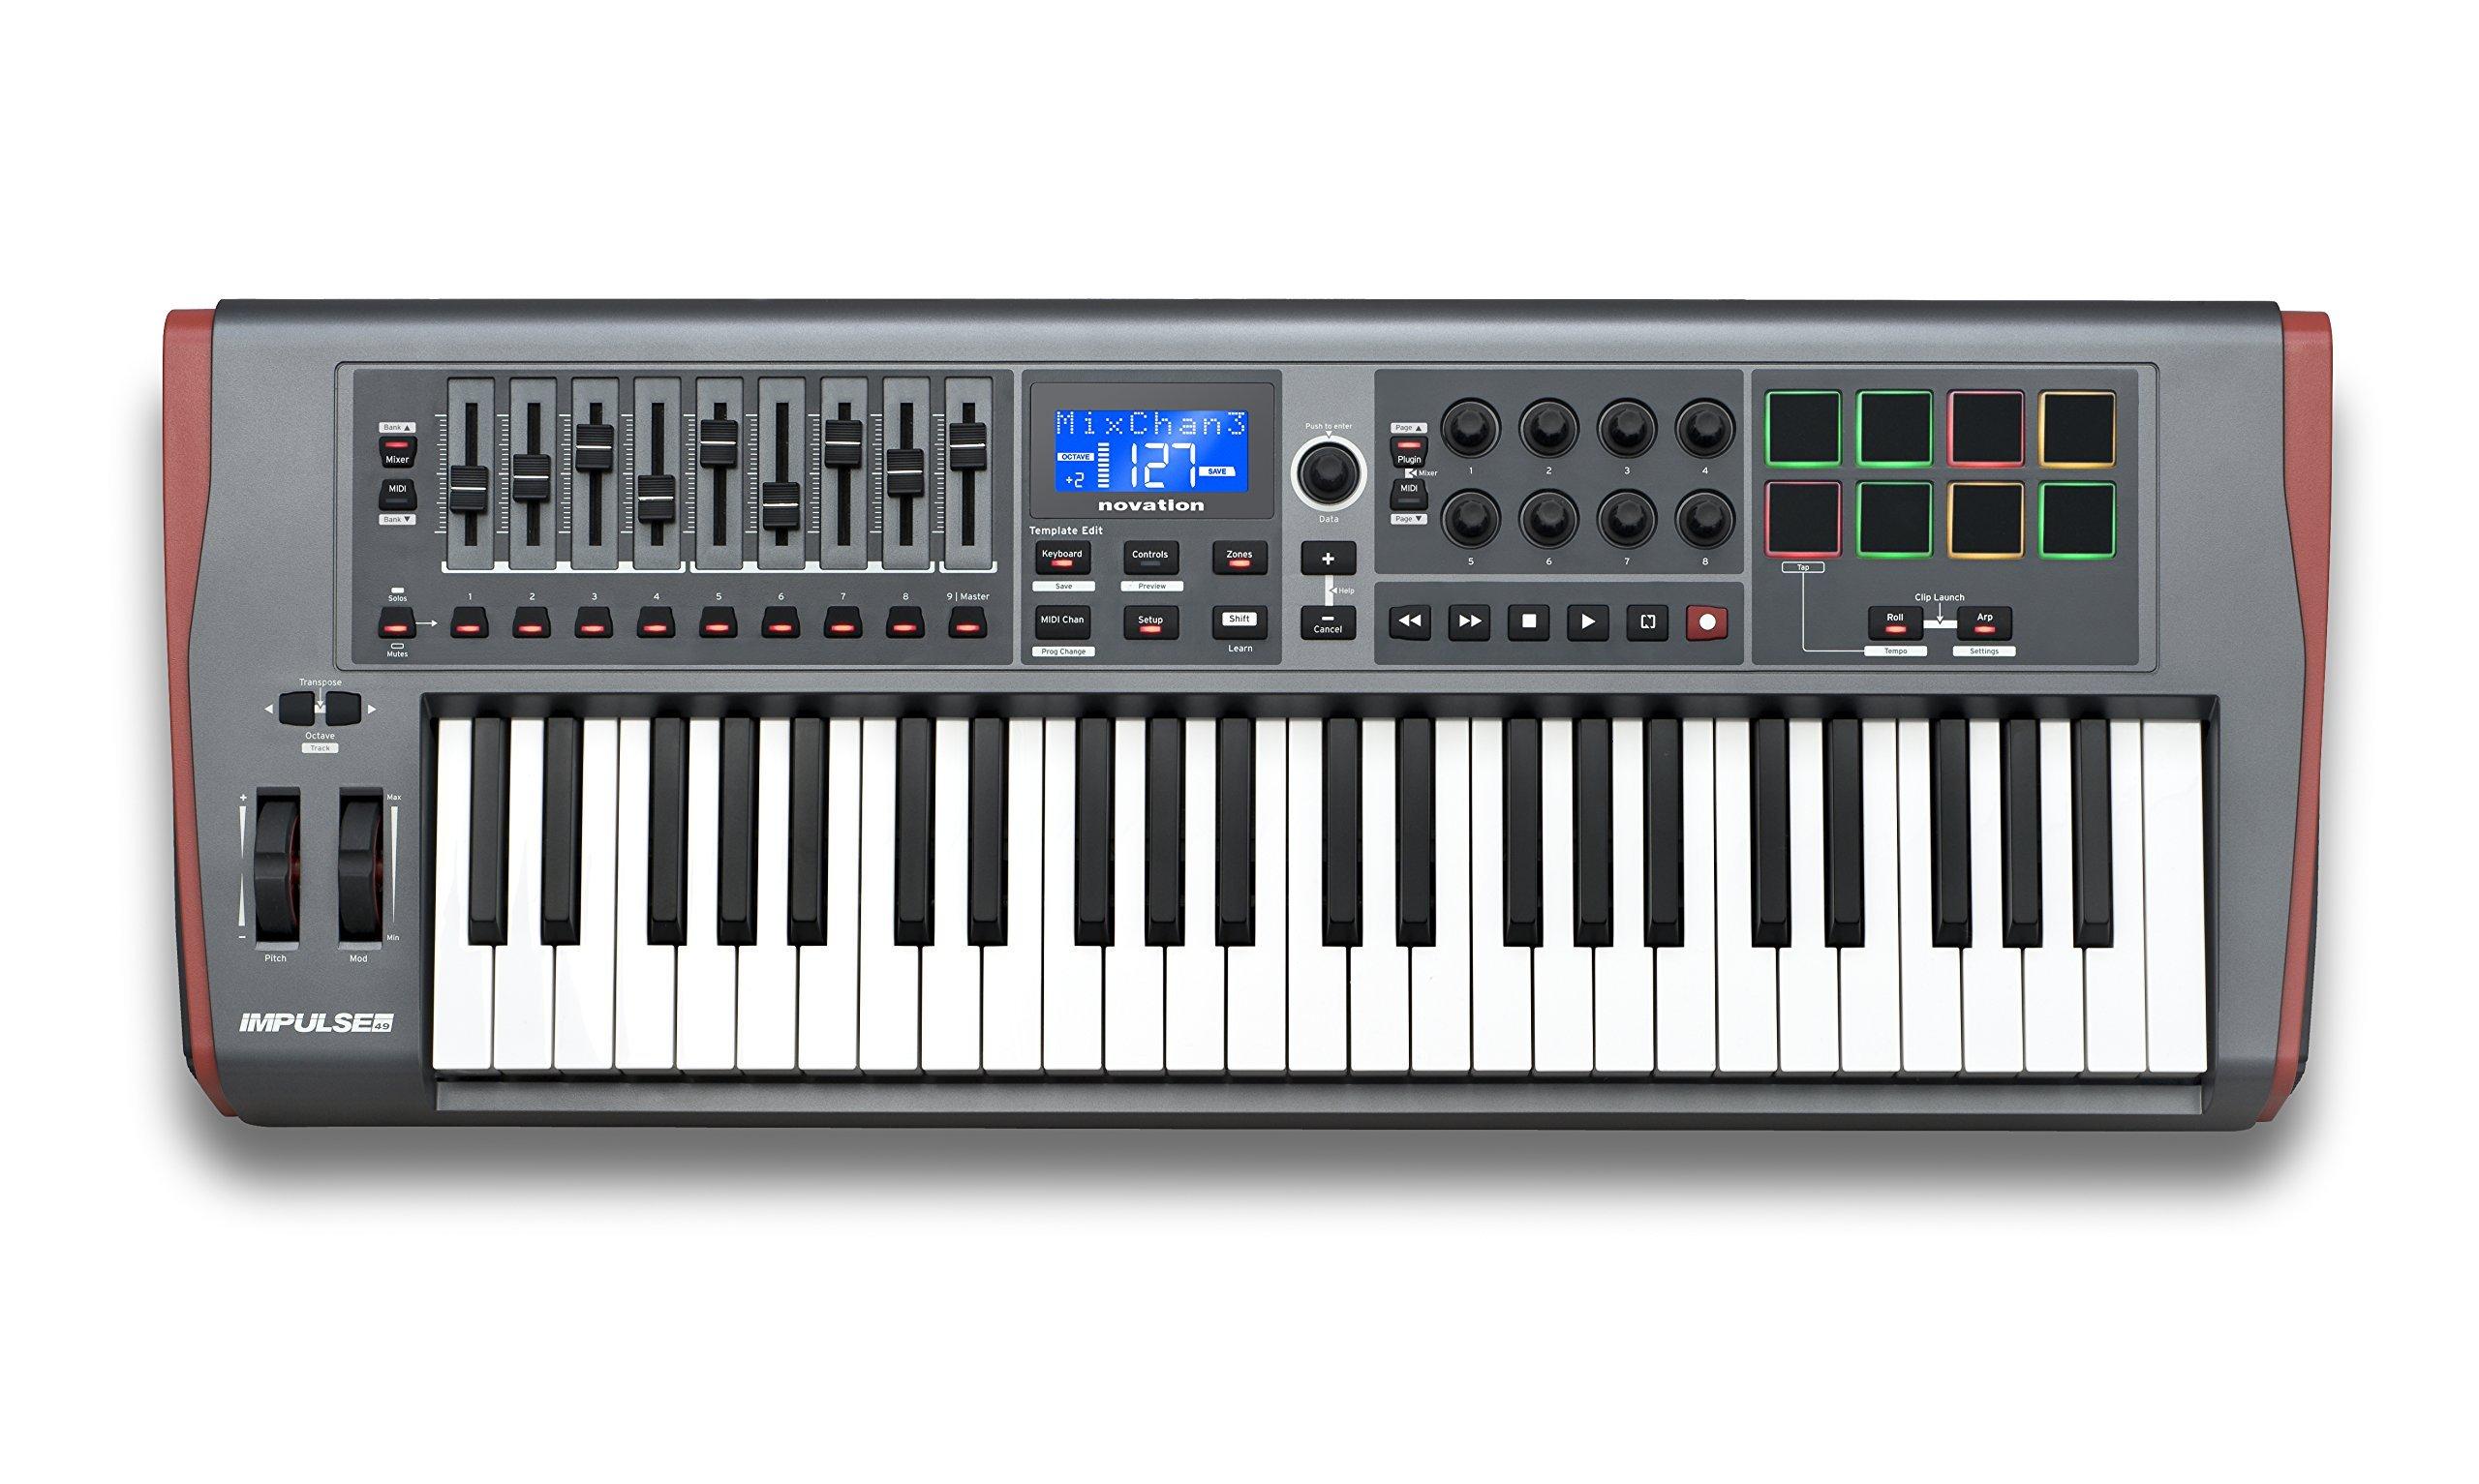 Novation Impulse 49 USB Midi Controller Keyboard, 49 Keys (Renewed) by Novation